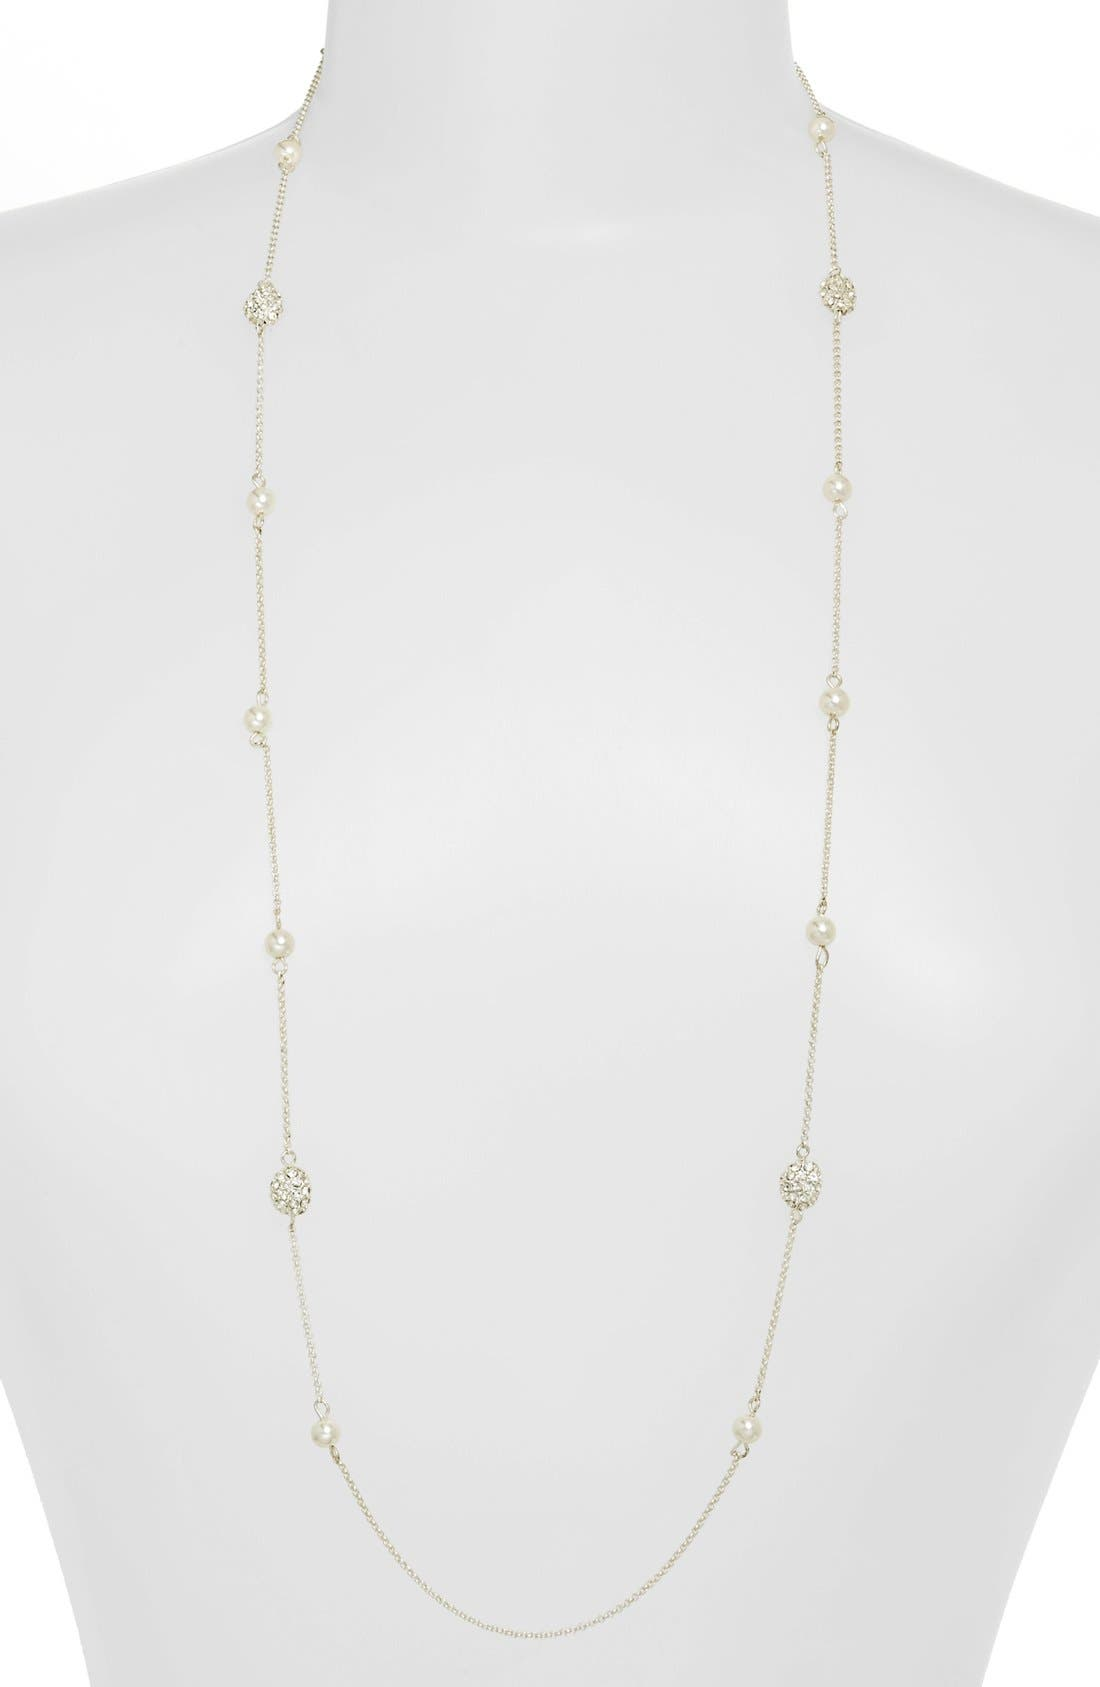 Alternate Image 1 Selected - Lauren Ralph Lauren Long Glass Pearl & Pavé Bead Illusion Necklace